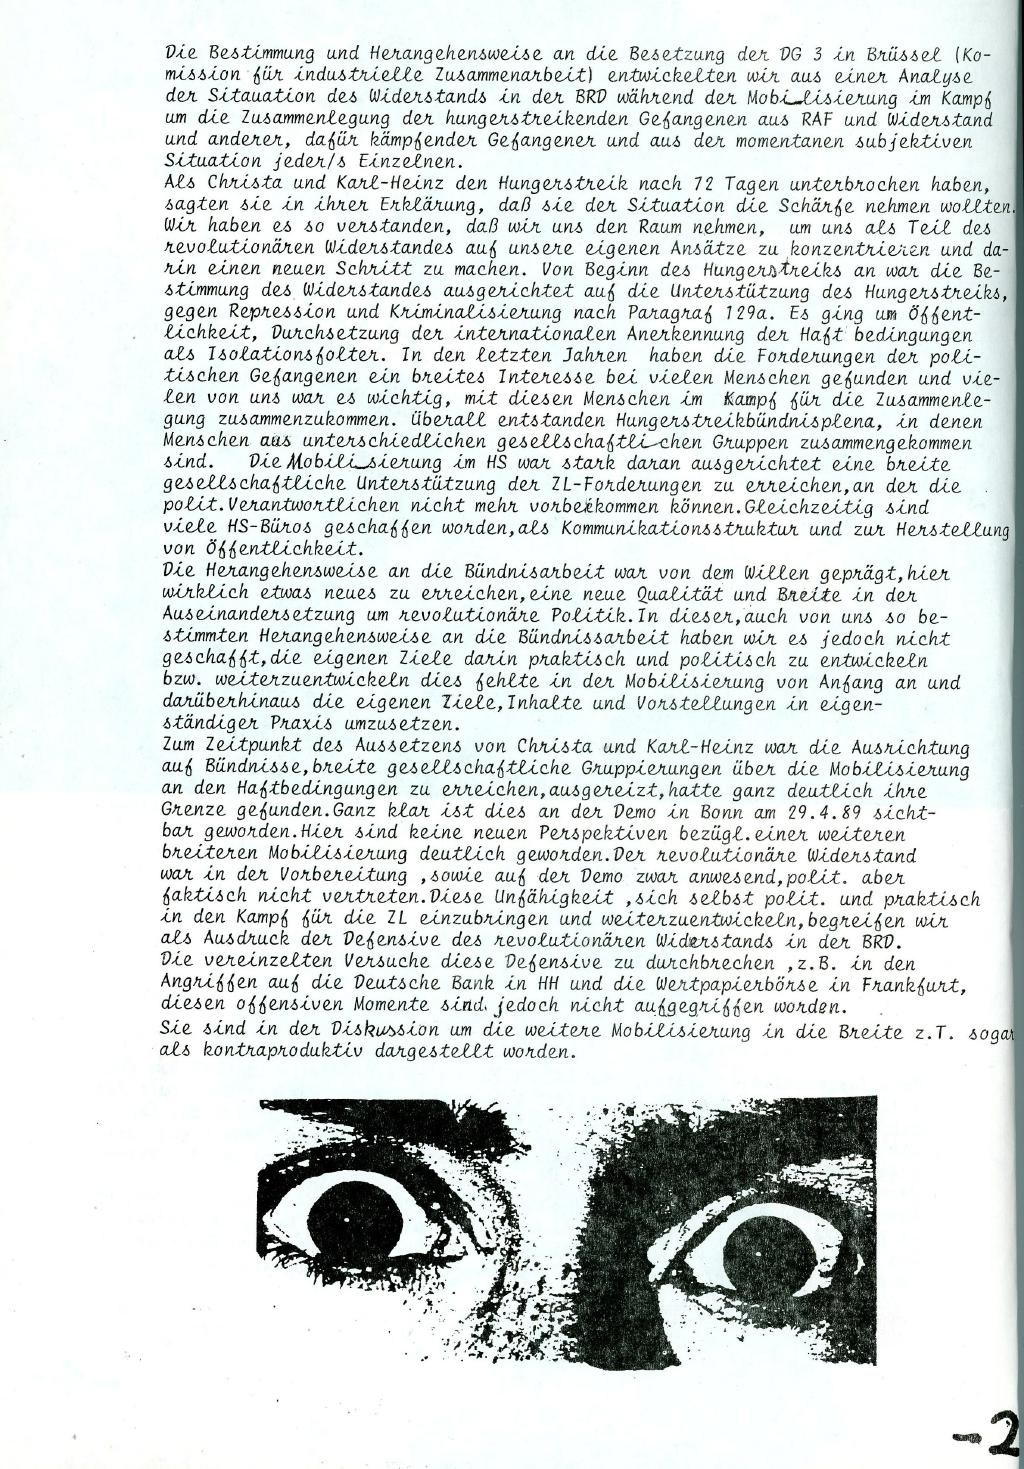 Belgien_Doku_Besetzung_EG_Kommission_1989_004